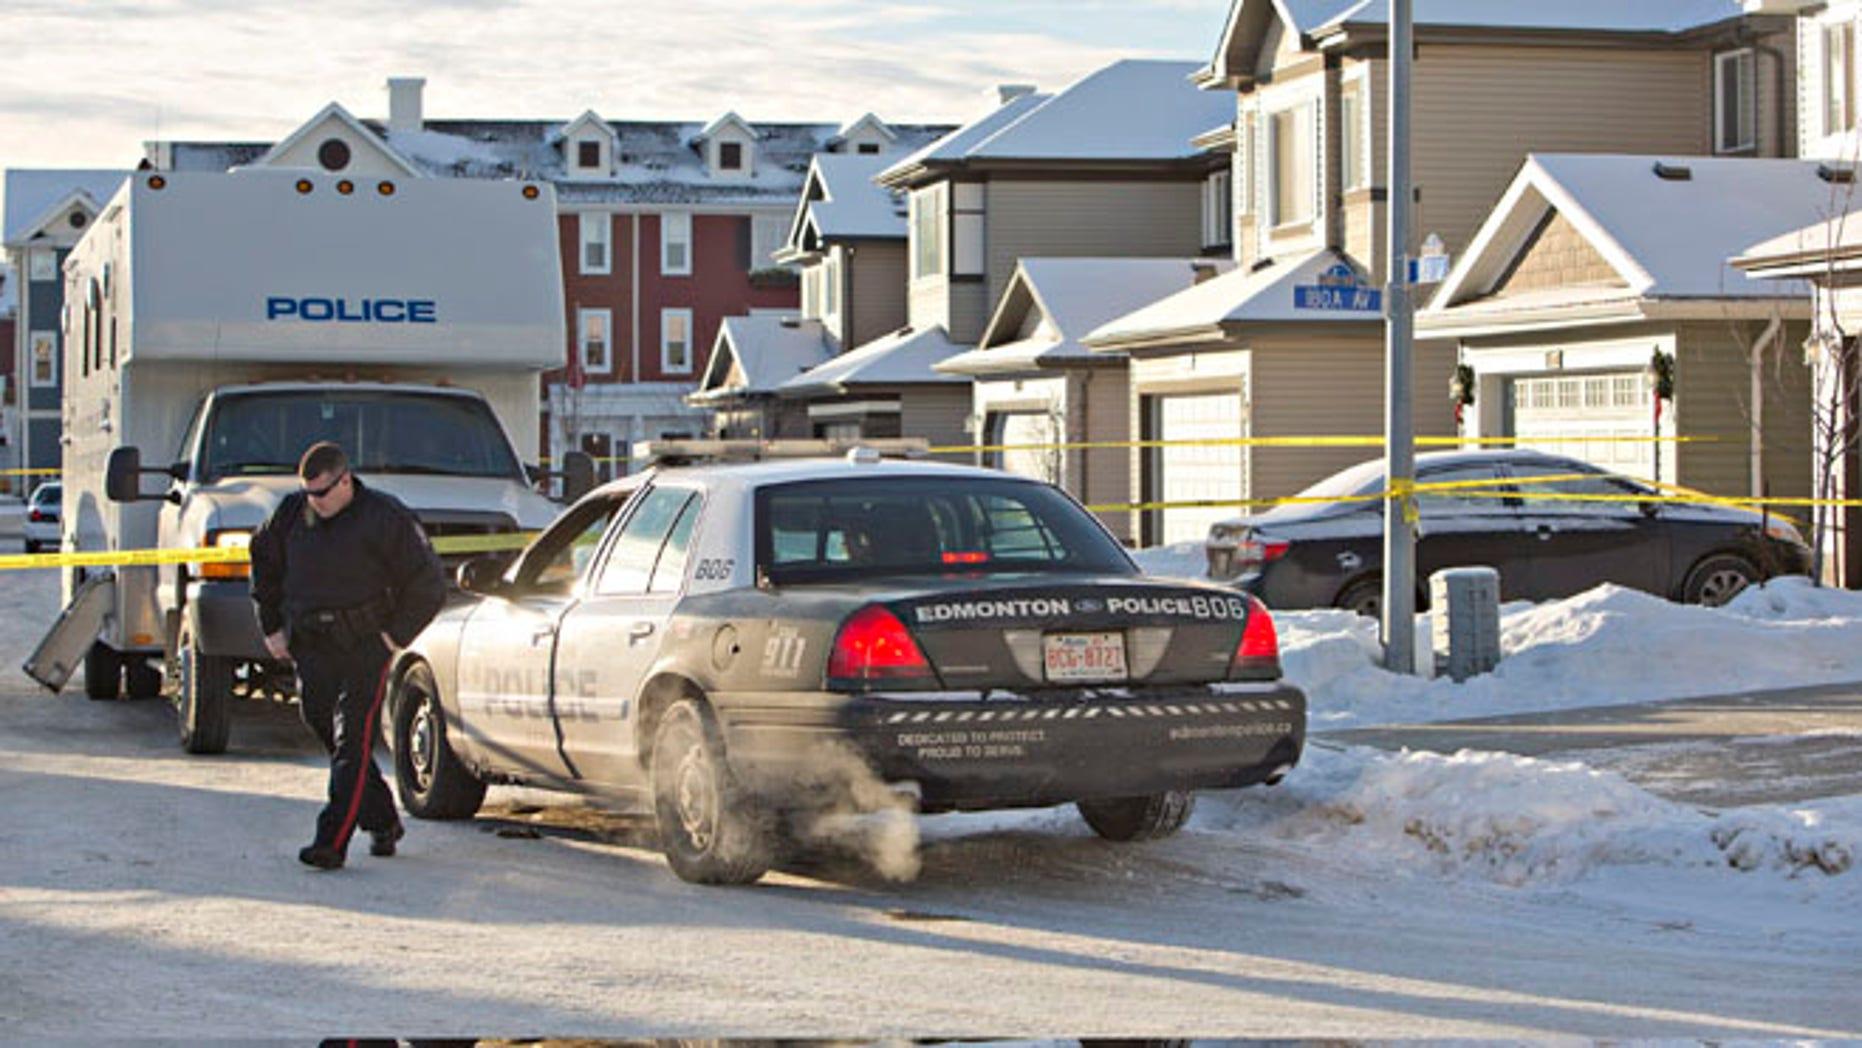 Dec. 30, 2014: Police investigate the scene where multiple deaths occurred overnight in Edmonton, Alberta. (AP)